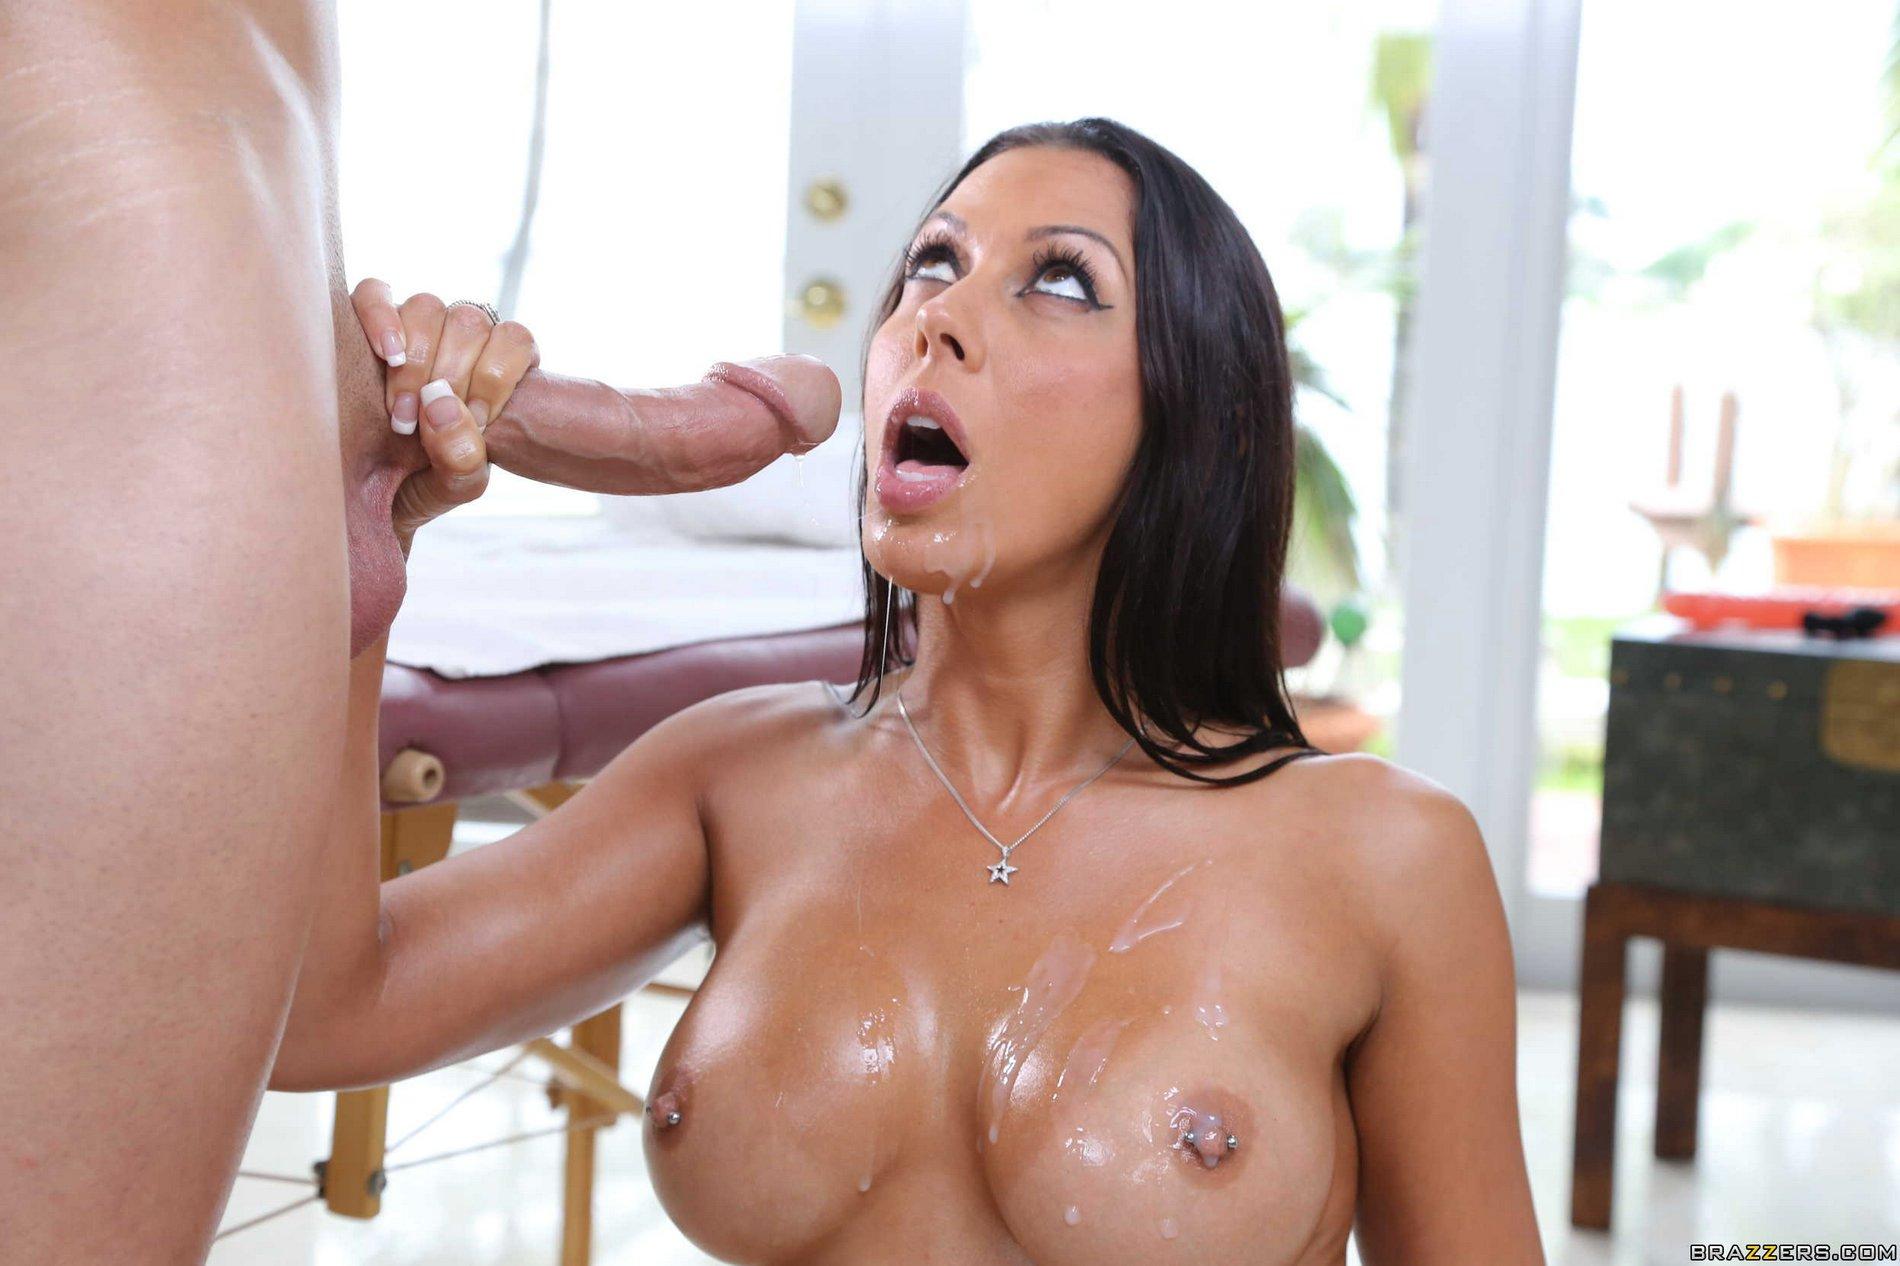 Rachel Starr Porn Star Pics